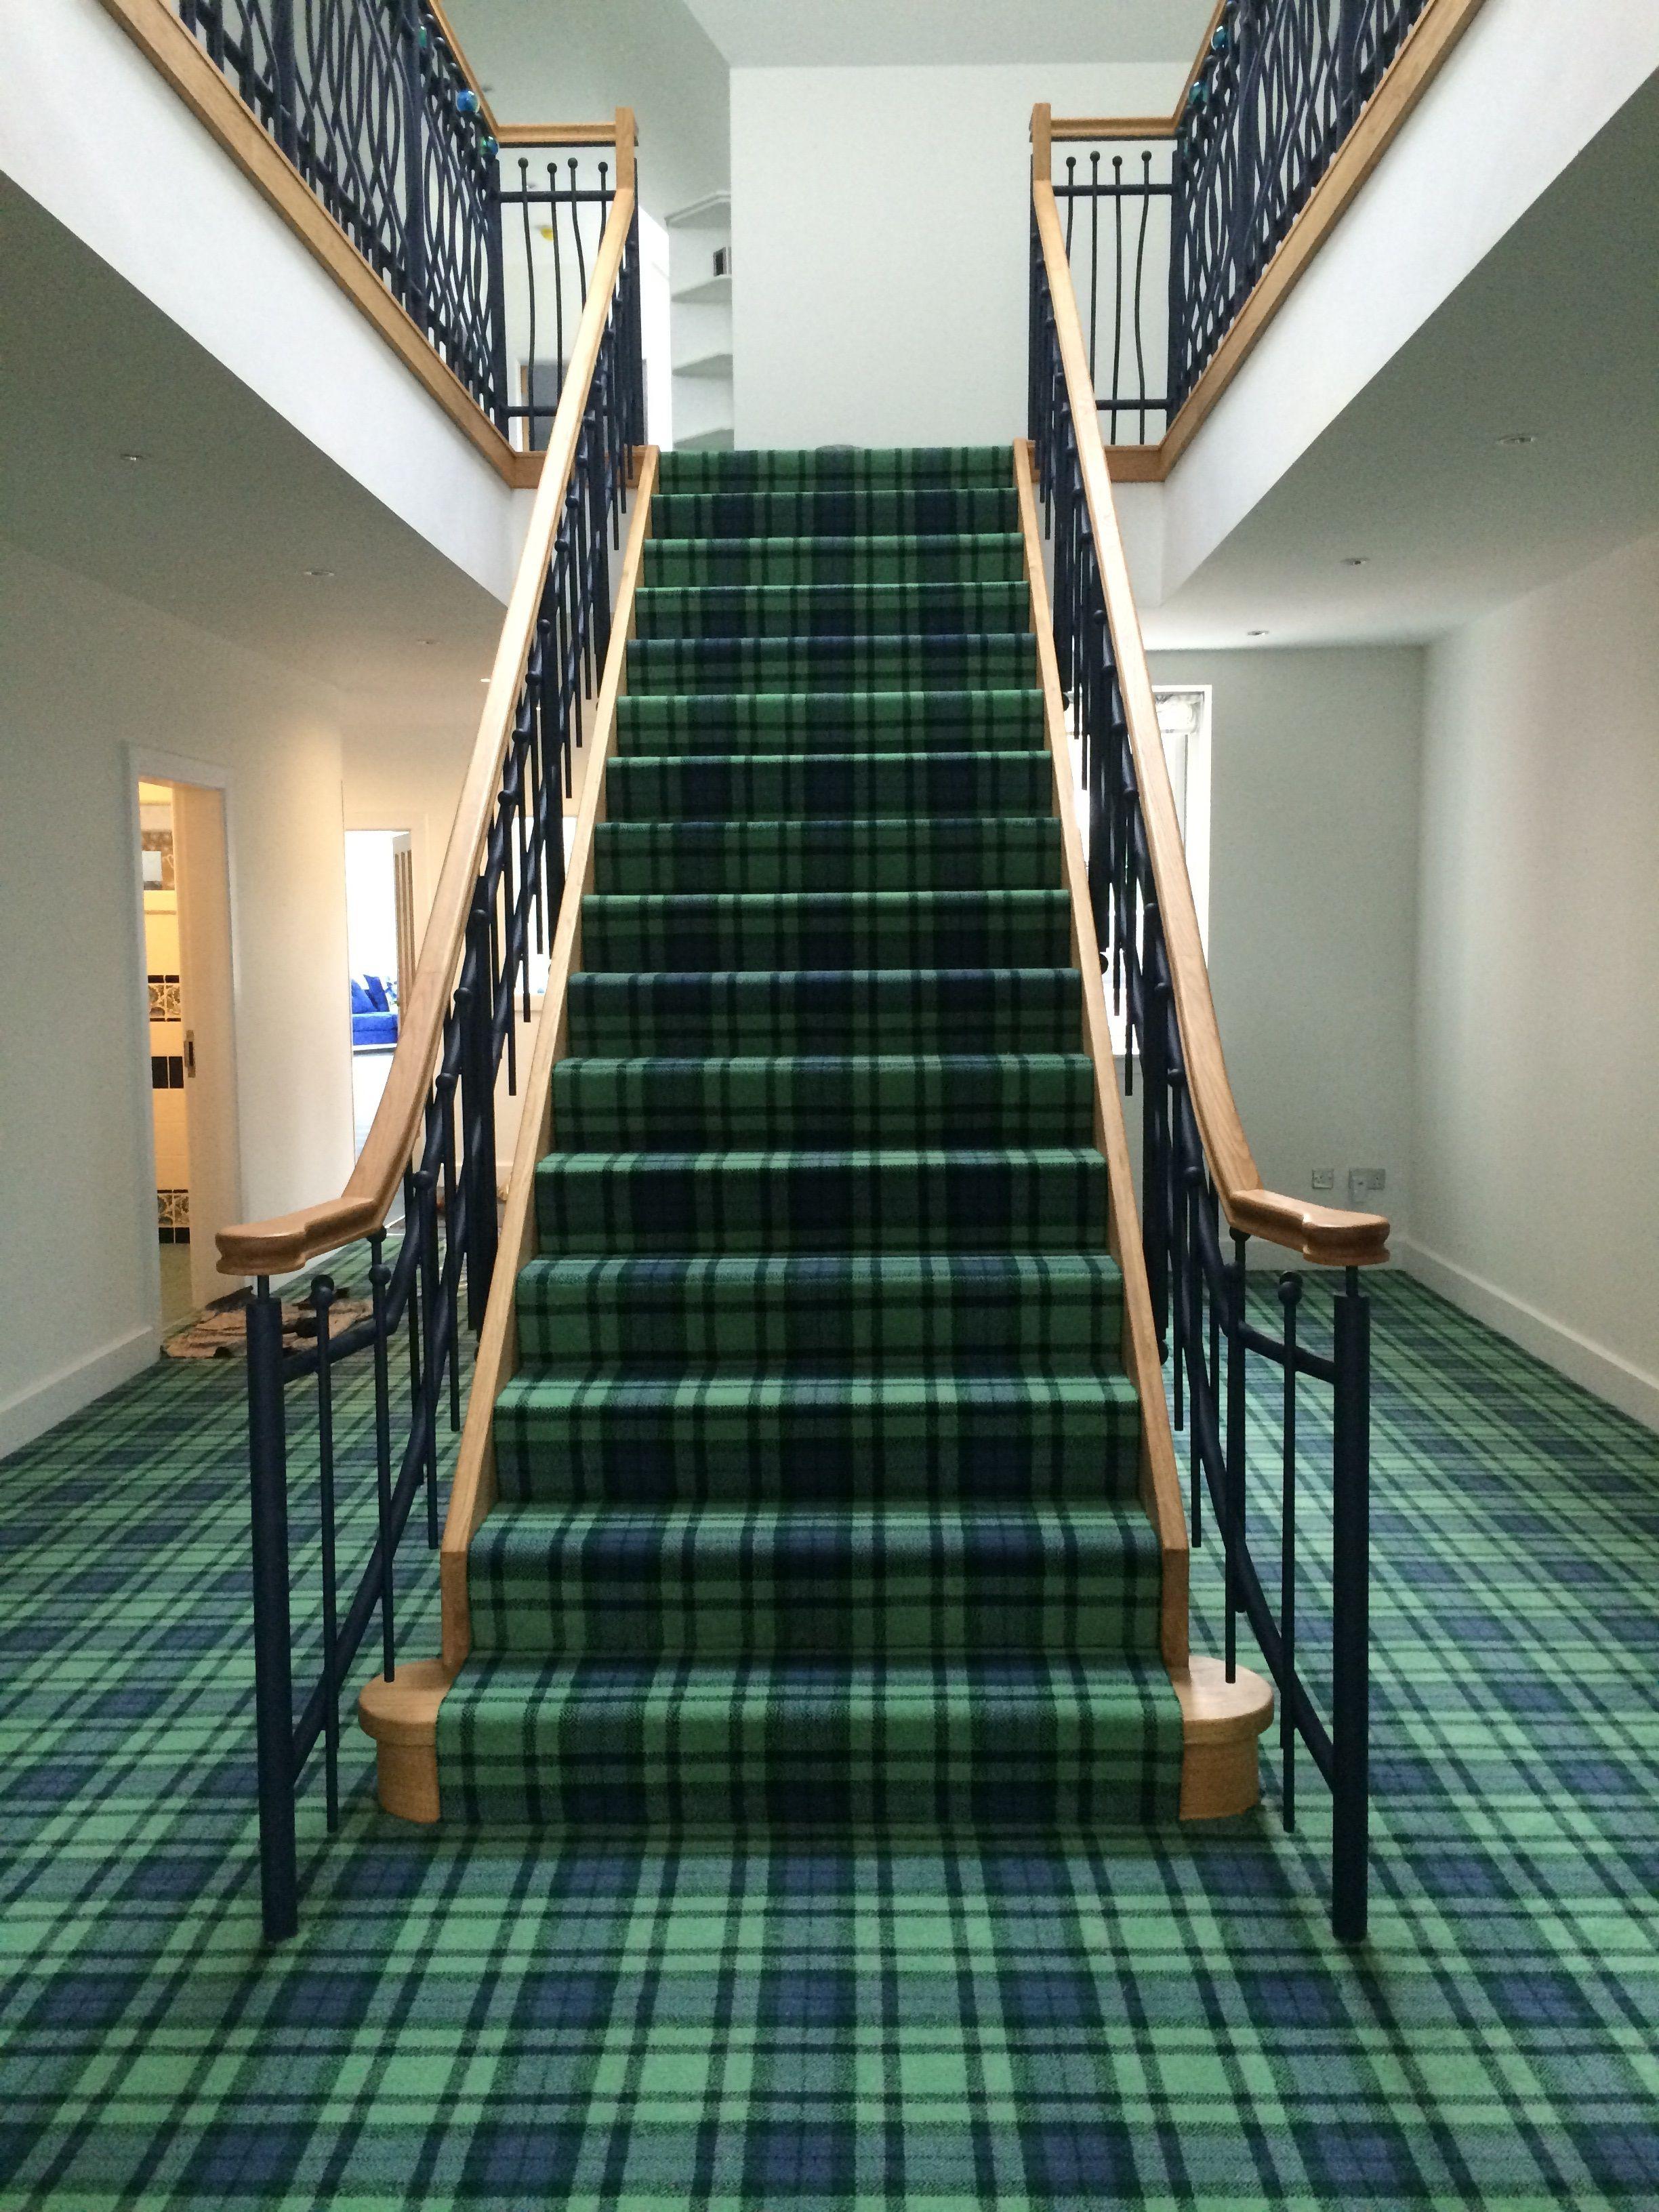 Maccallum Tartan Carpet Installation Designed